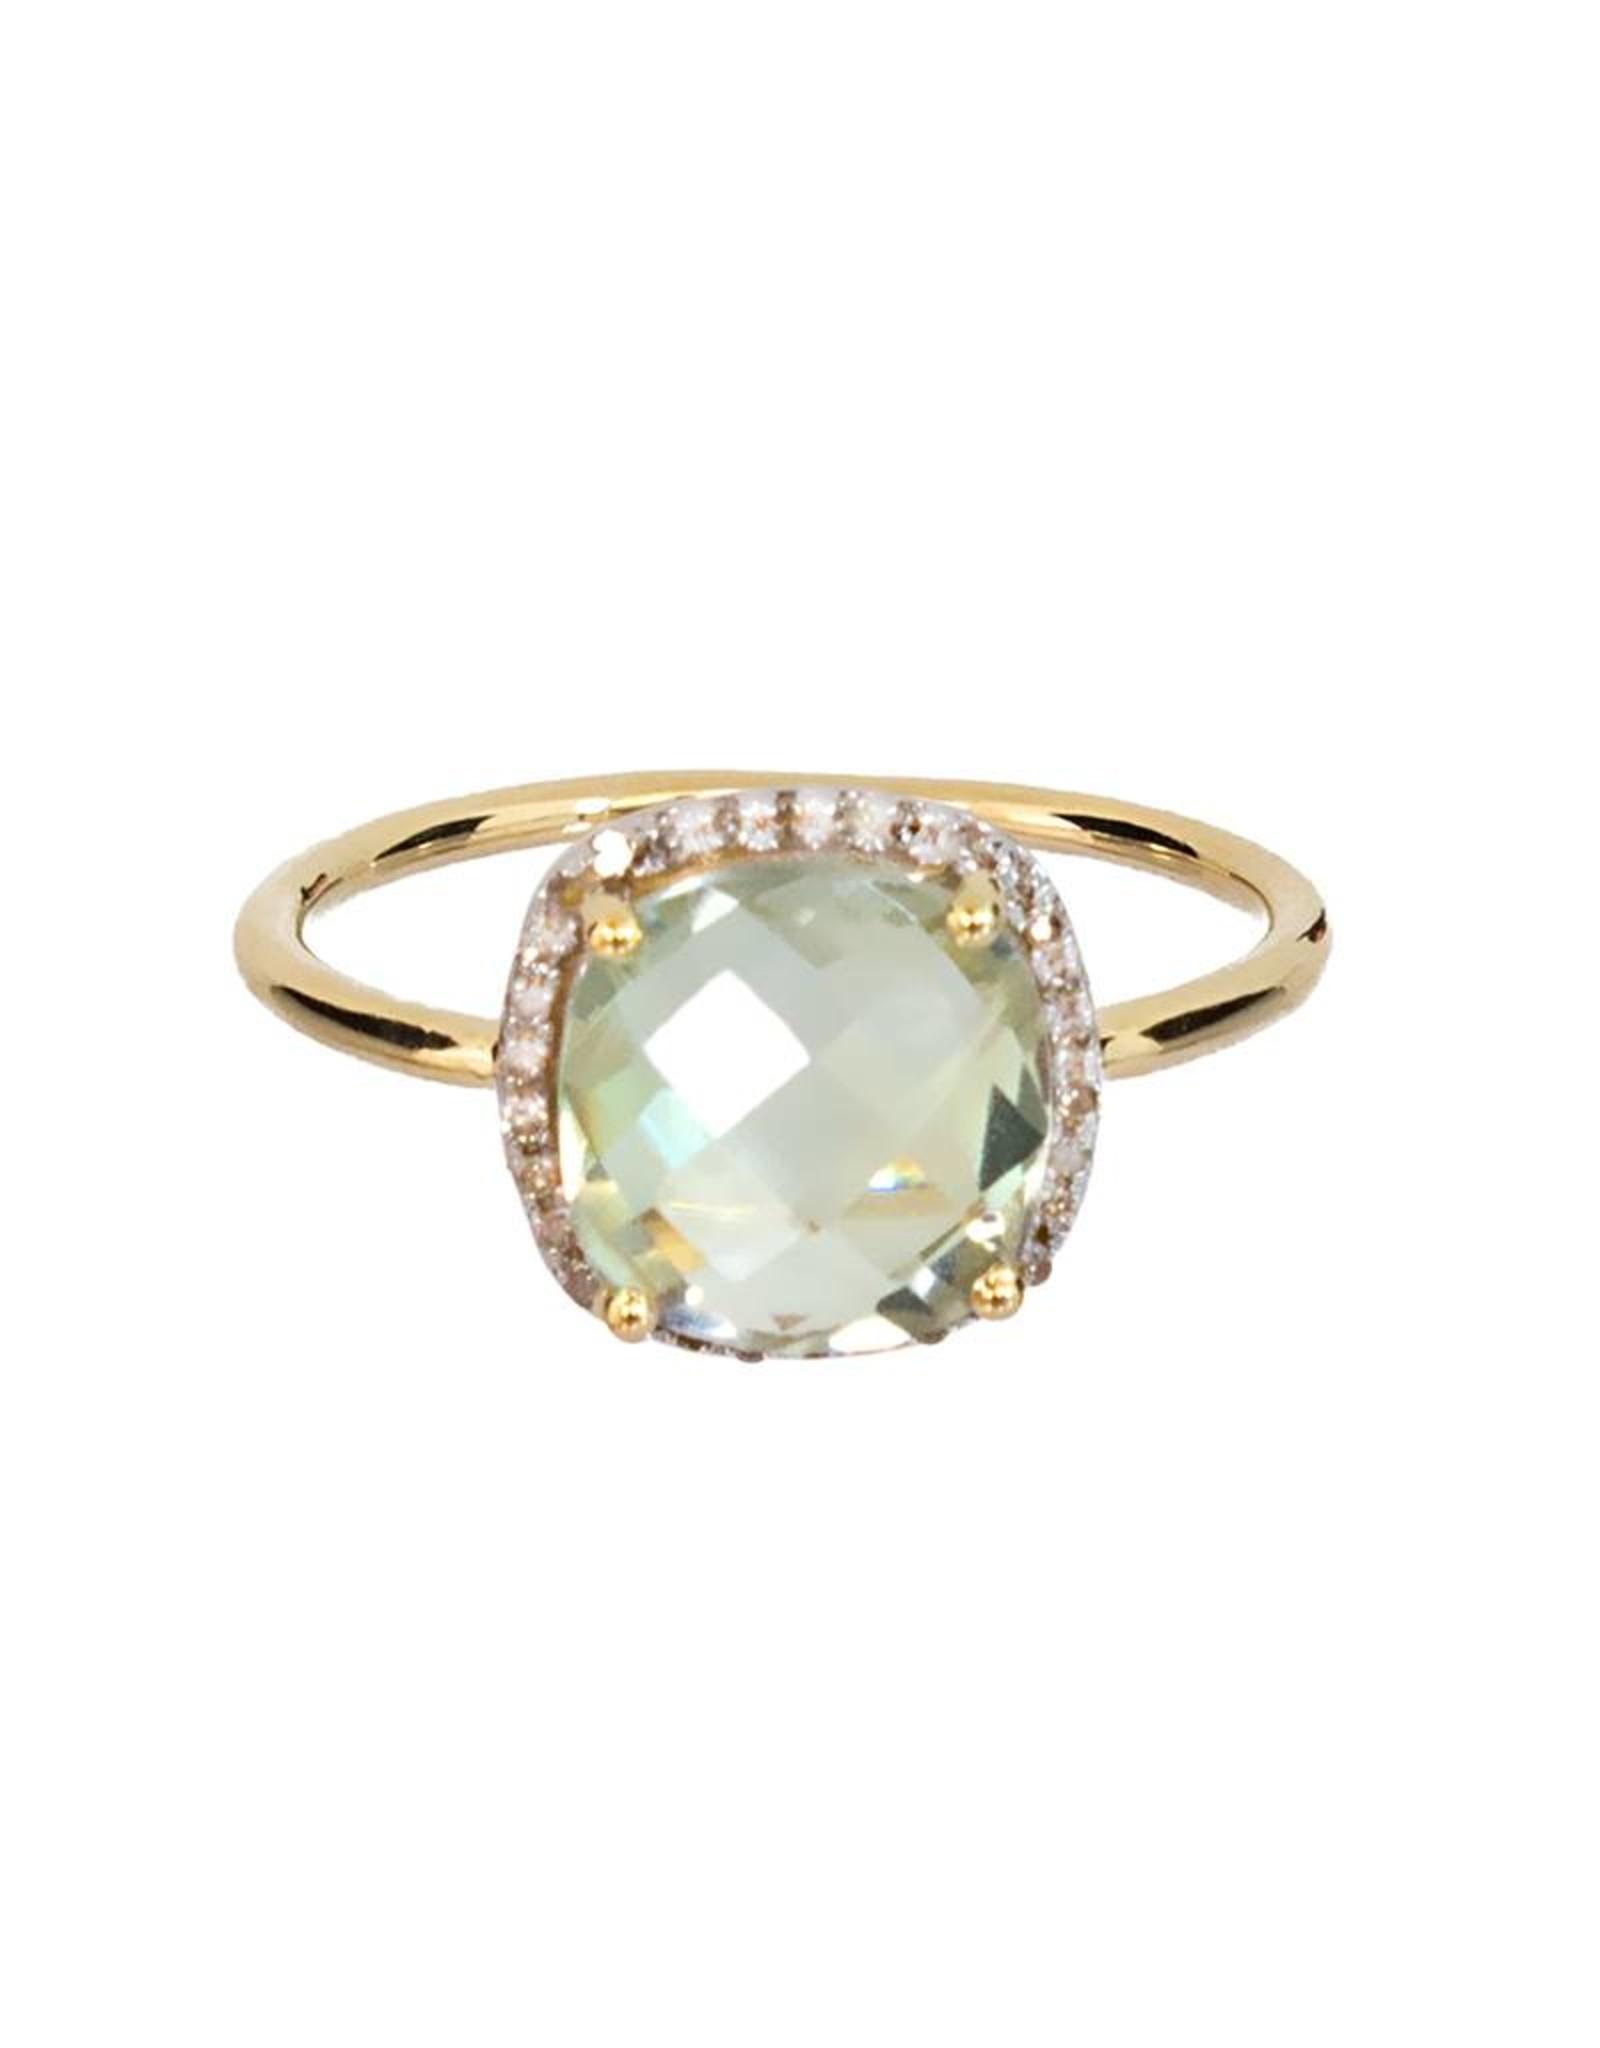 Bo Gold Ring - Gold - Green amethyst